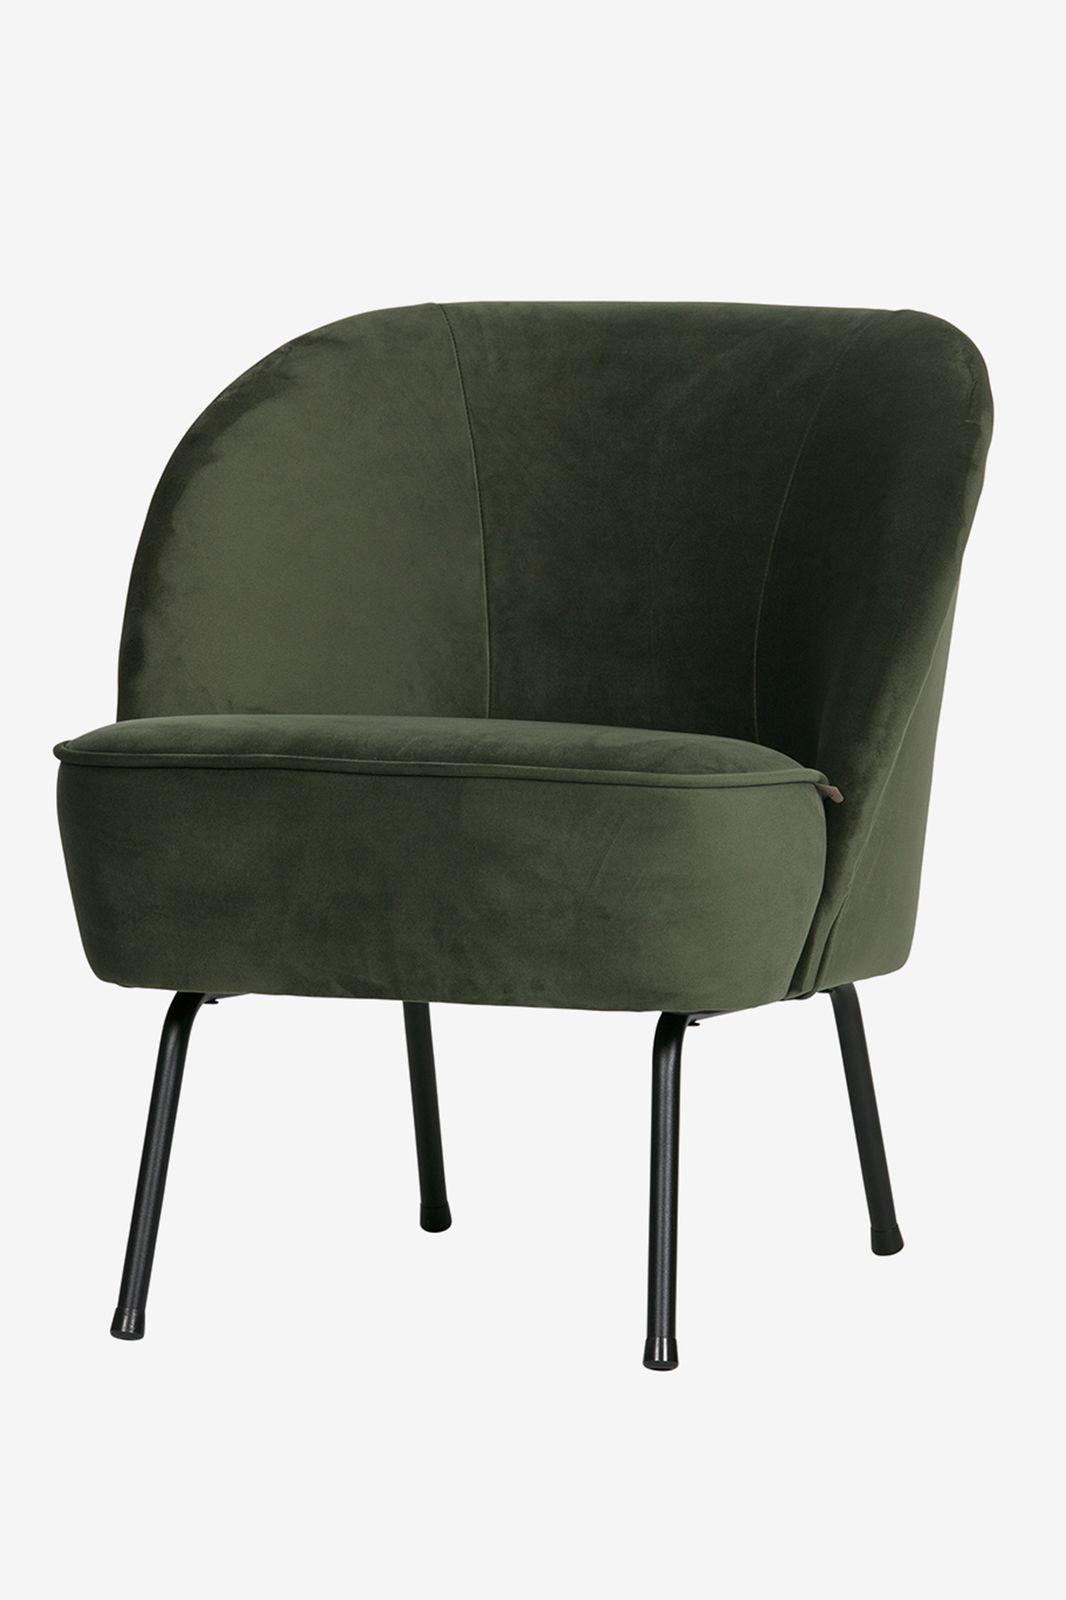 BePureHome Vogue fauteuil fluweel donkergroen - Homeland | Sissy-Boy